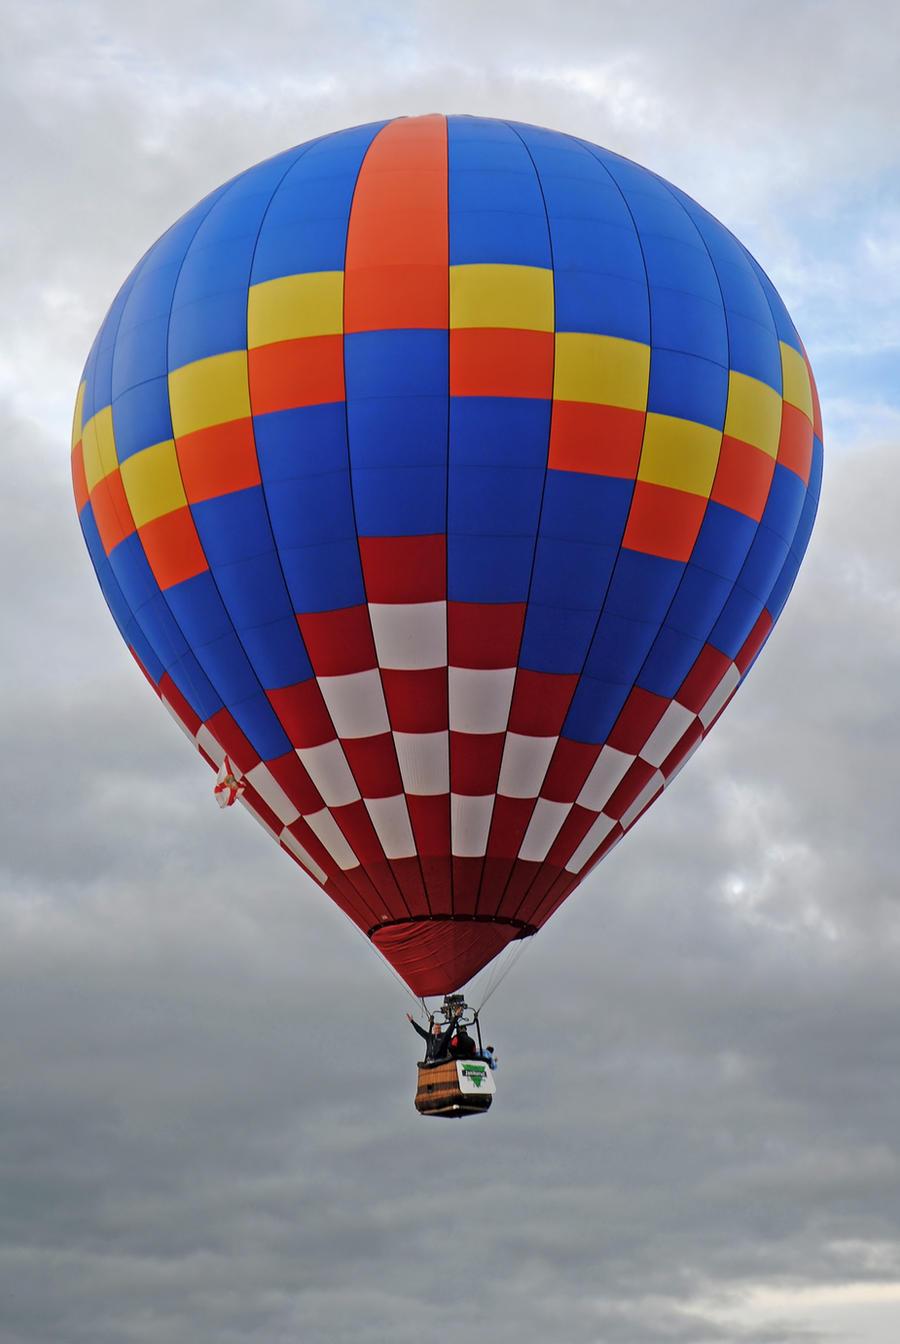 Balloon fiesta 10 by LucieG-Stock